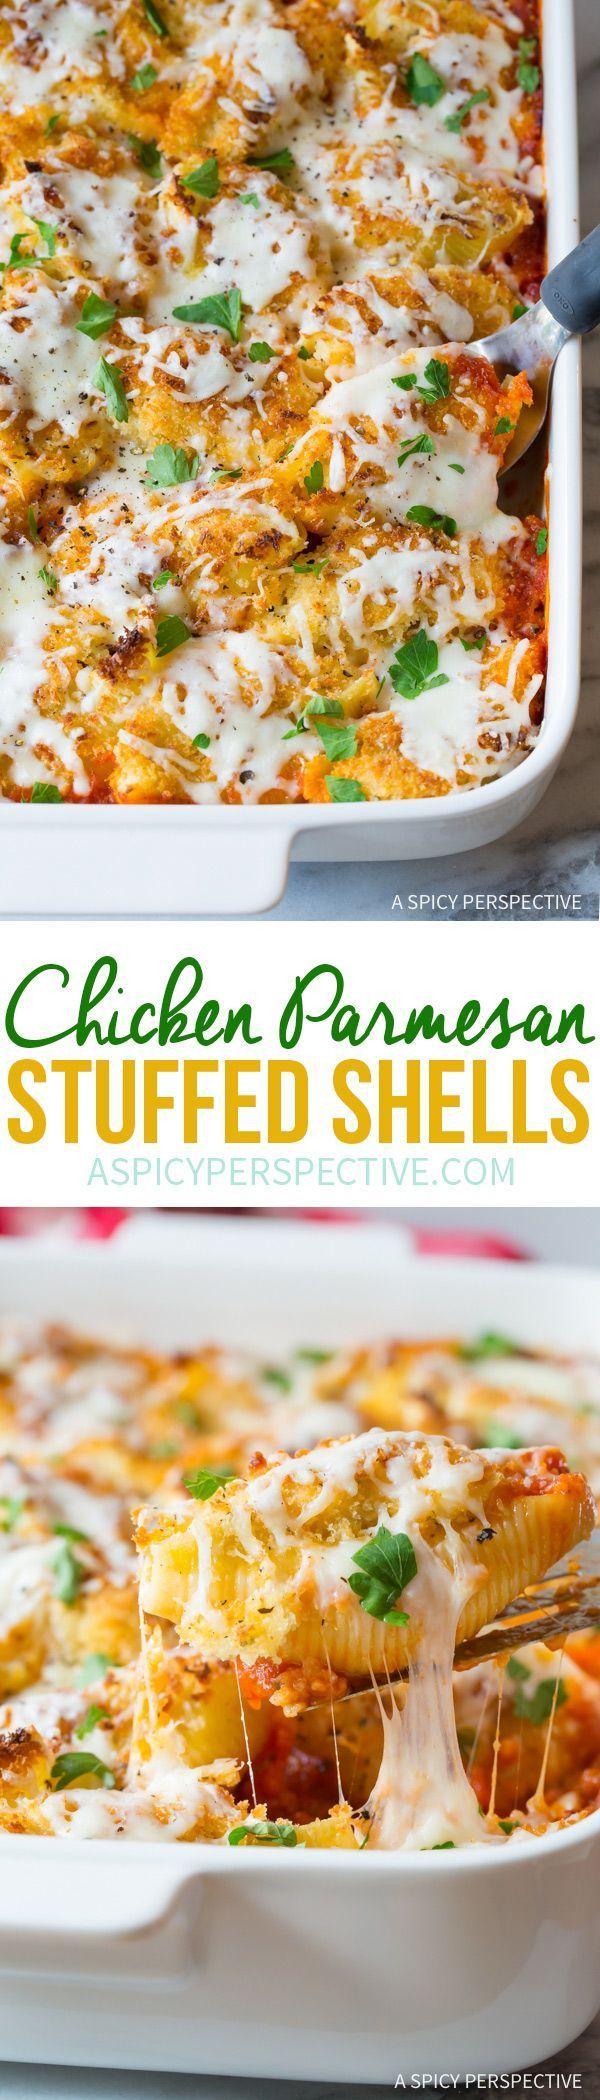 Perfect Chicken Parmesan Stuffed Shells Recipe via /spicyperspectiv/ (Chicken Parmesan)